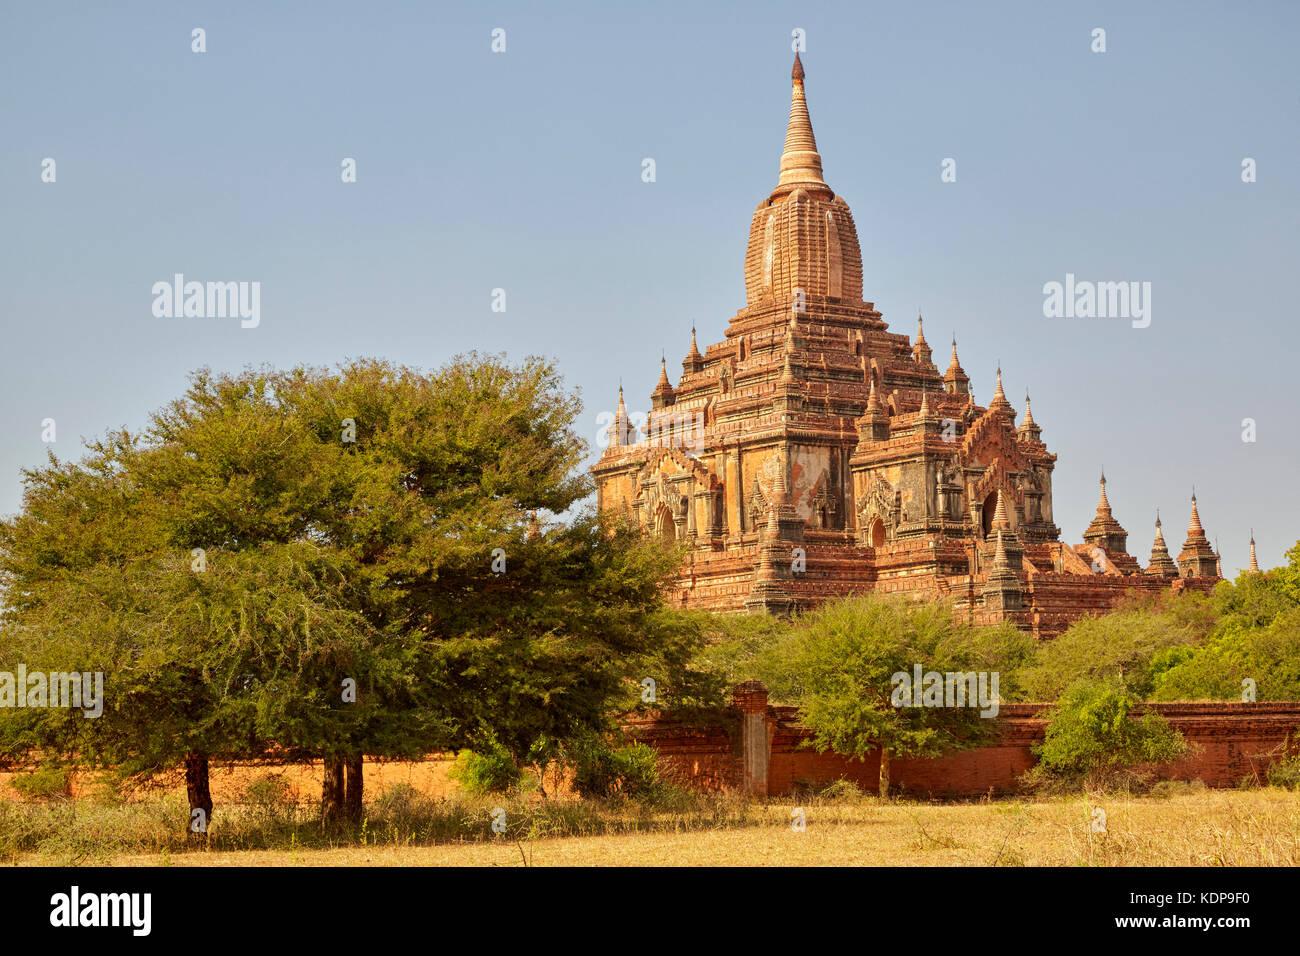 Sulamani Temple, Bagan (Pagan), Myanmar (Burma), Southeast Asia - Stock Image